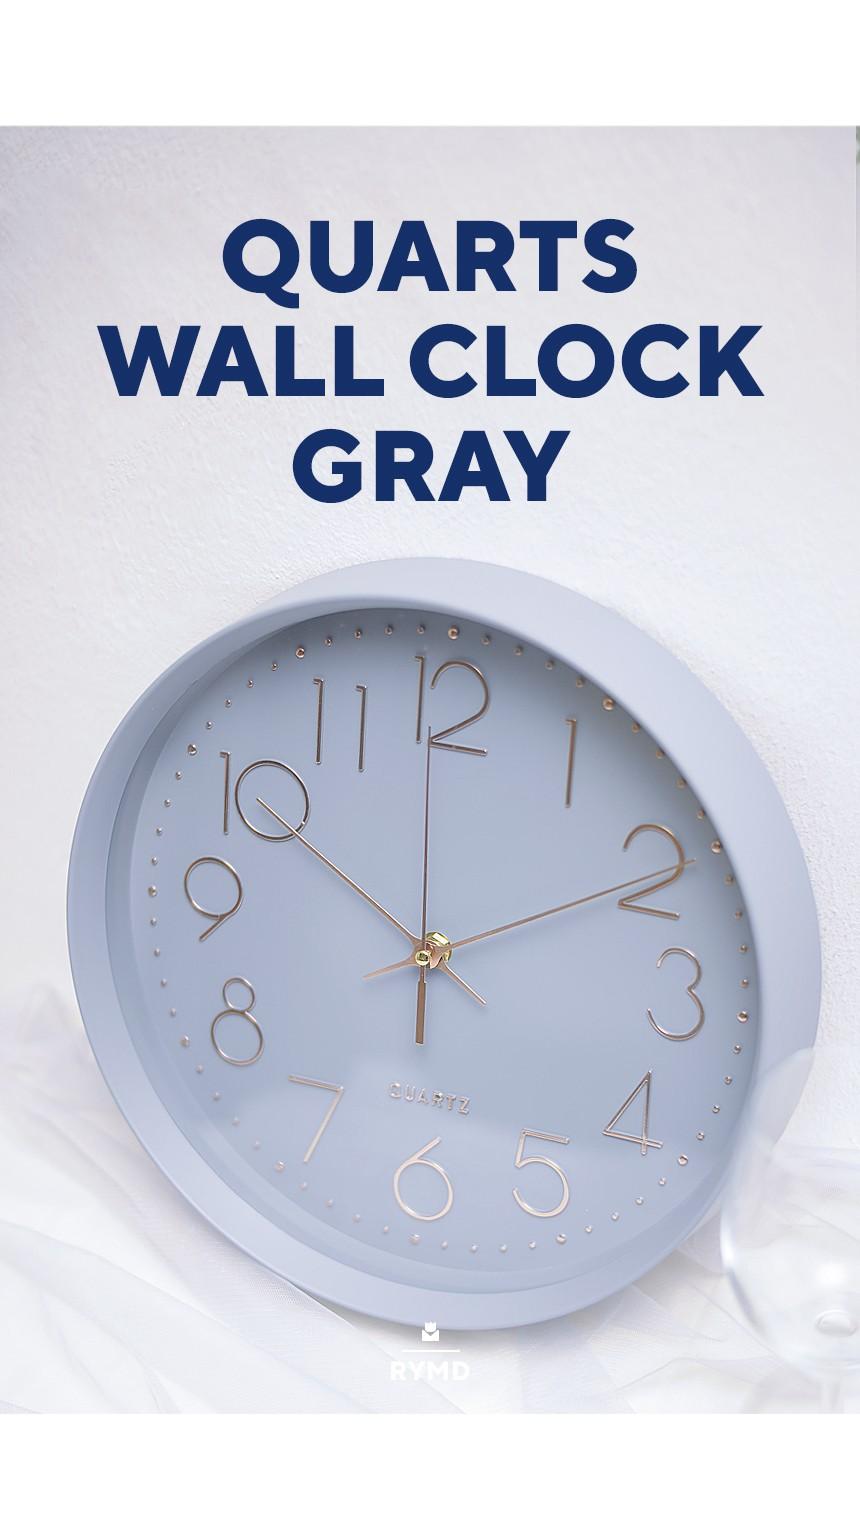 QUARTS_WALL_CLOCK_GRAY_06.jpg